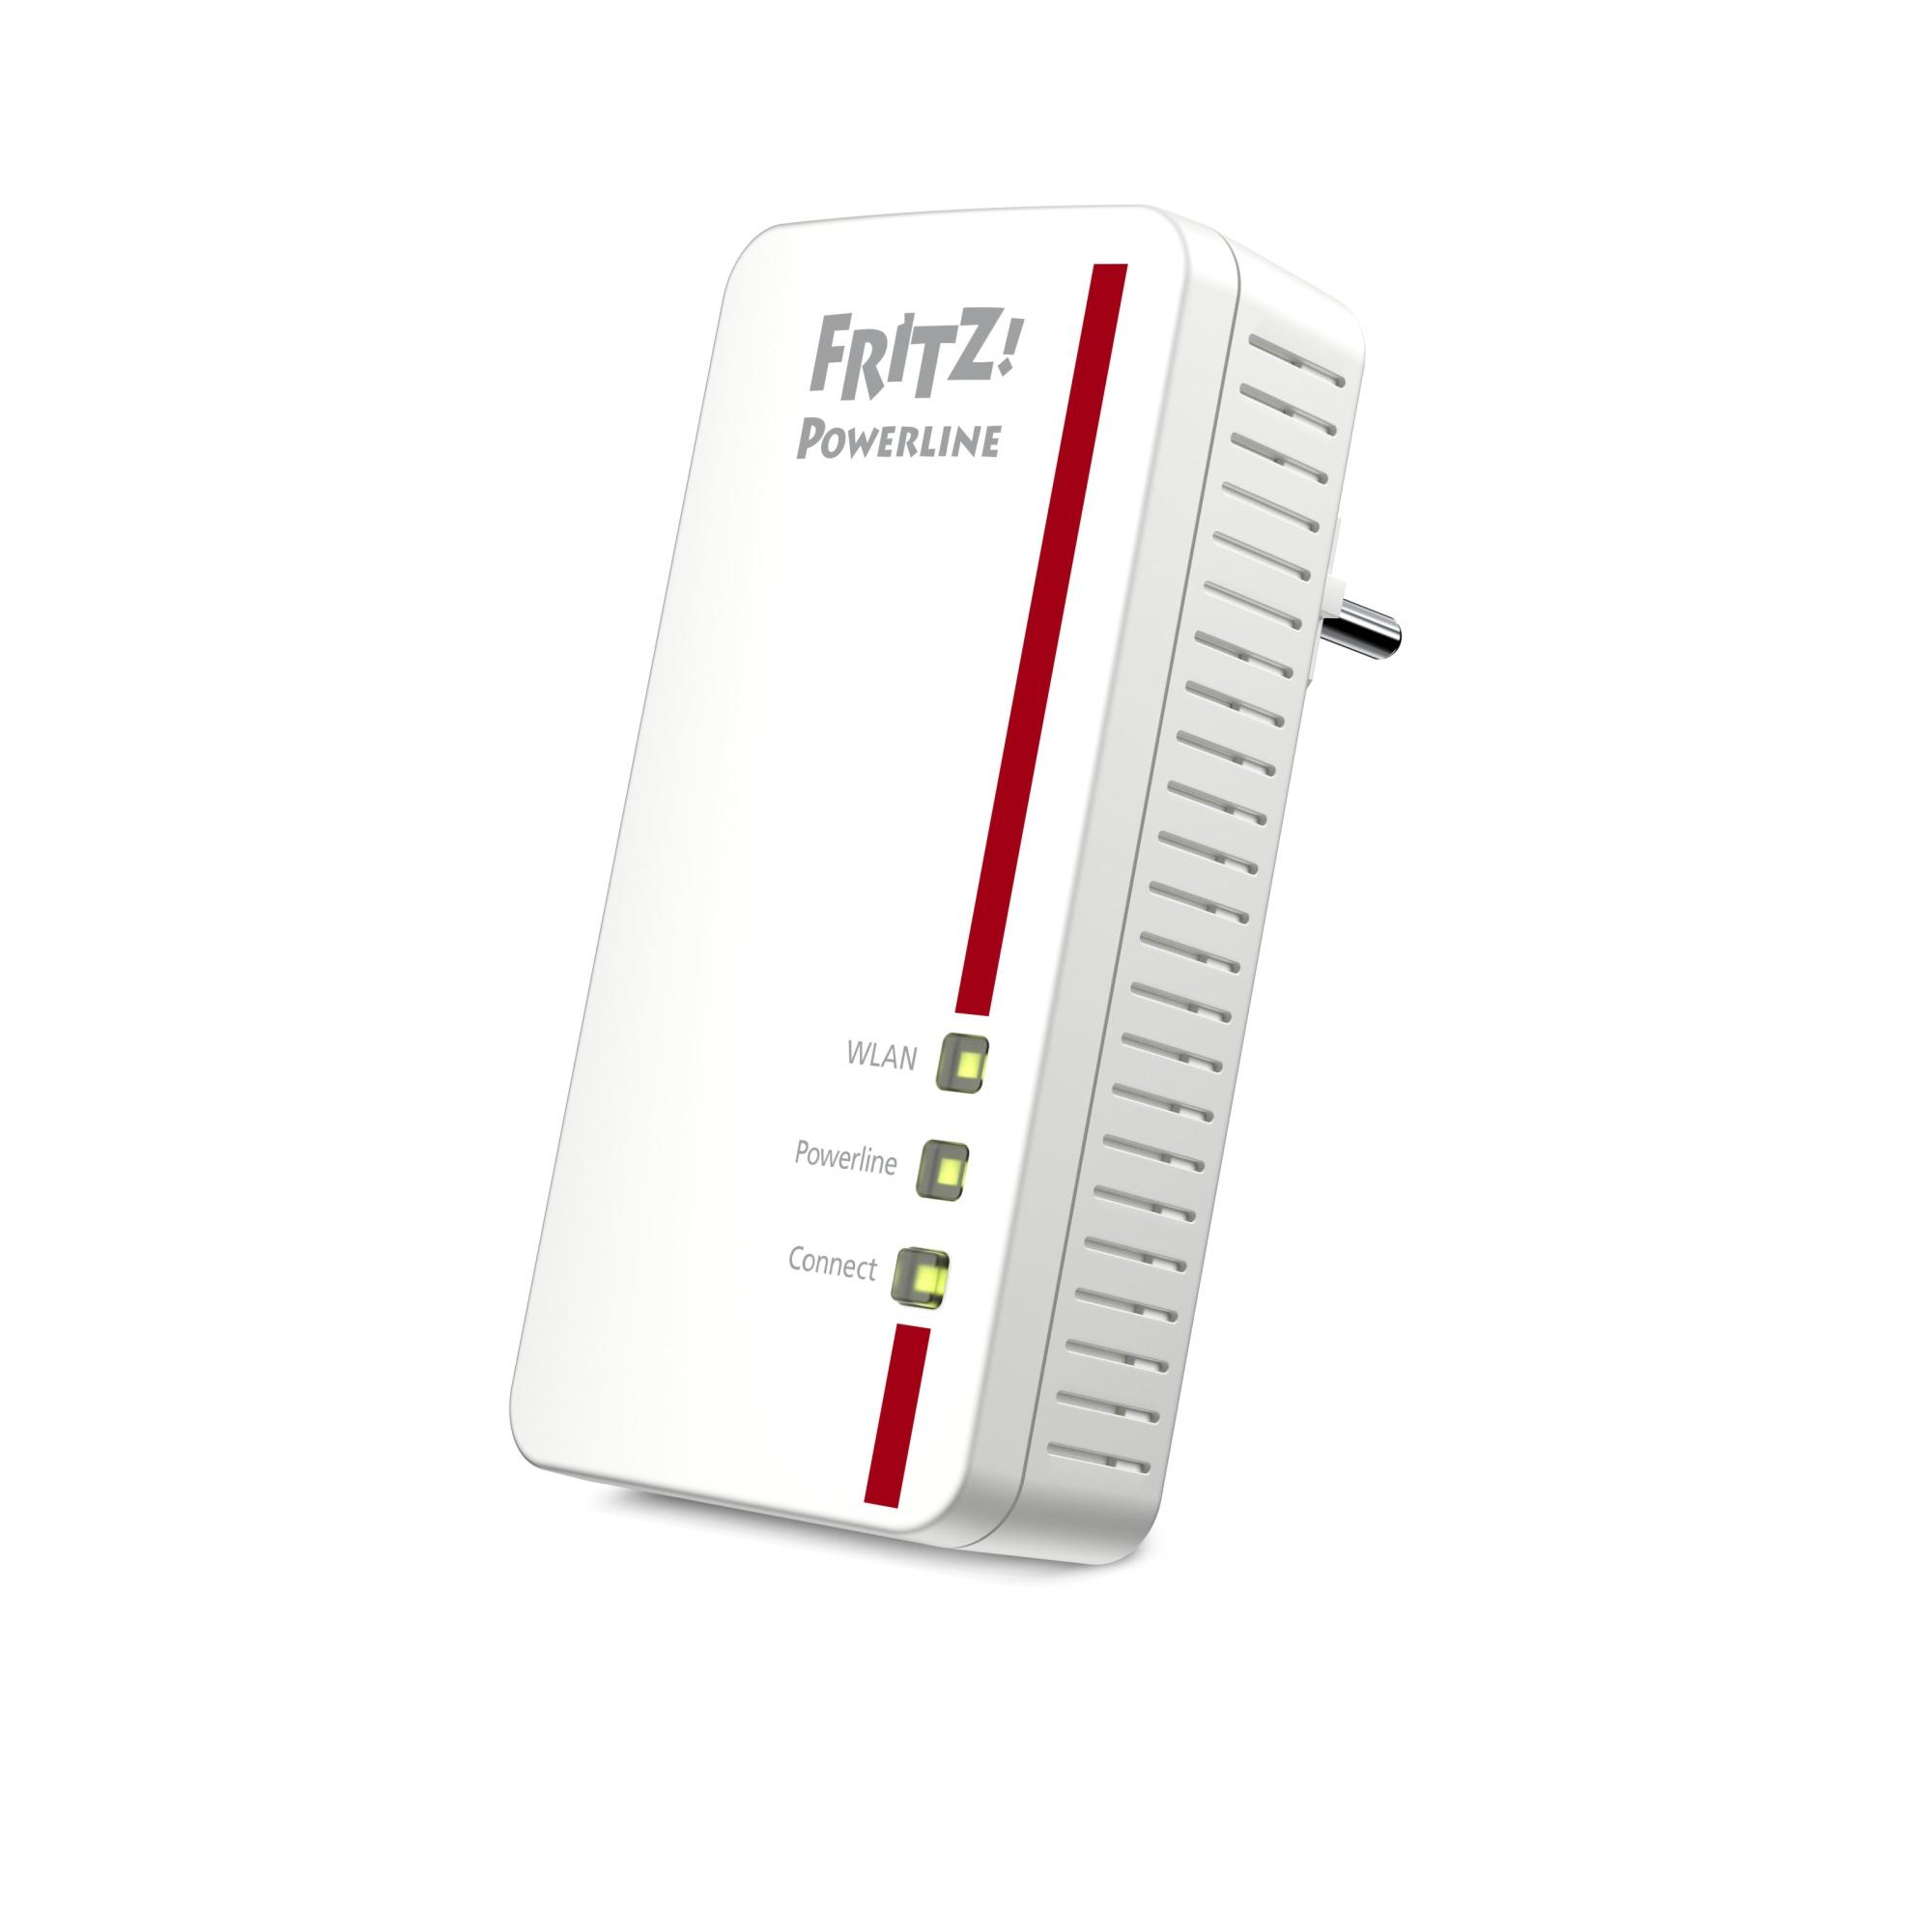 FRITZ!POWERLINE 1260E INTERNATIONAL 1200 MBIT/S ETHERNET WIFI 1 PIEZA(S)